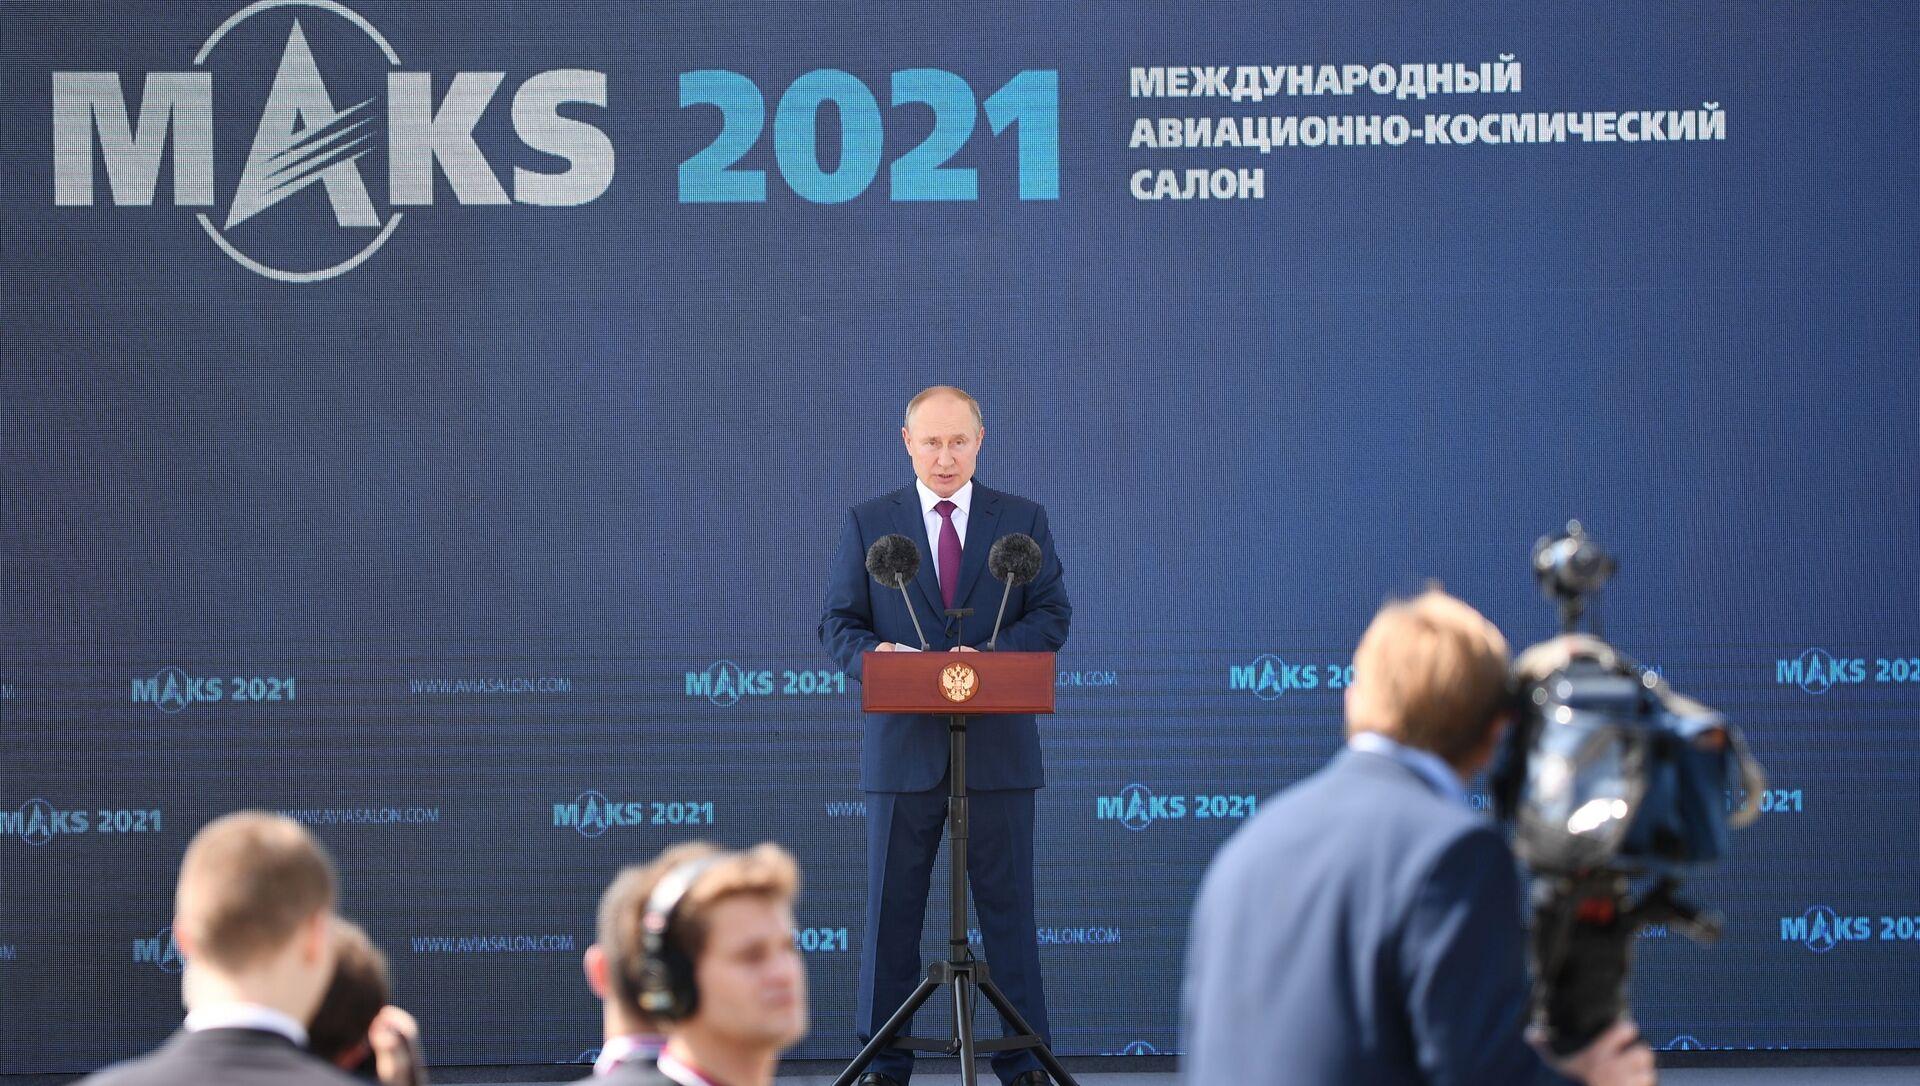 Tổng thống Nga Vladimir Putin dự nghi lễ khai mạc MAKS-2021 - Sputnik Việt Nam, 1920, 20.07.2021